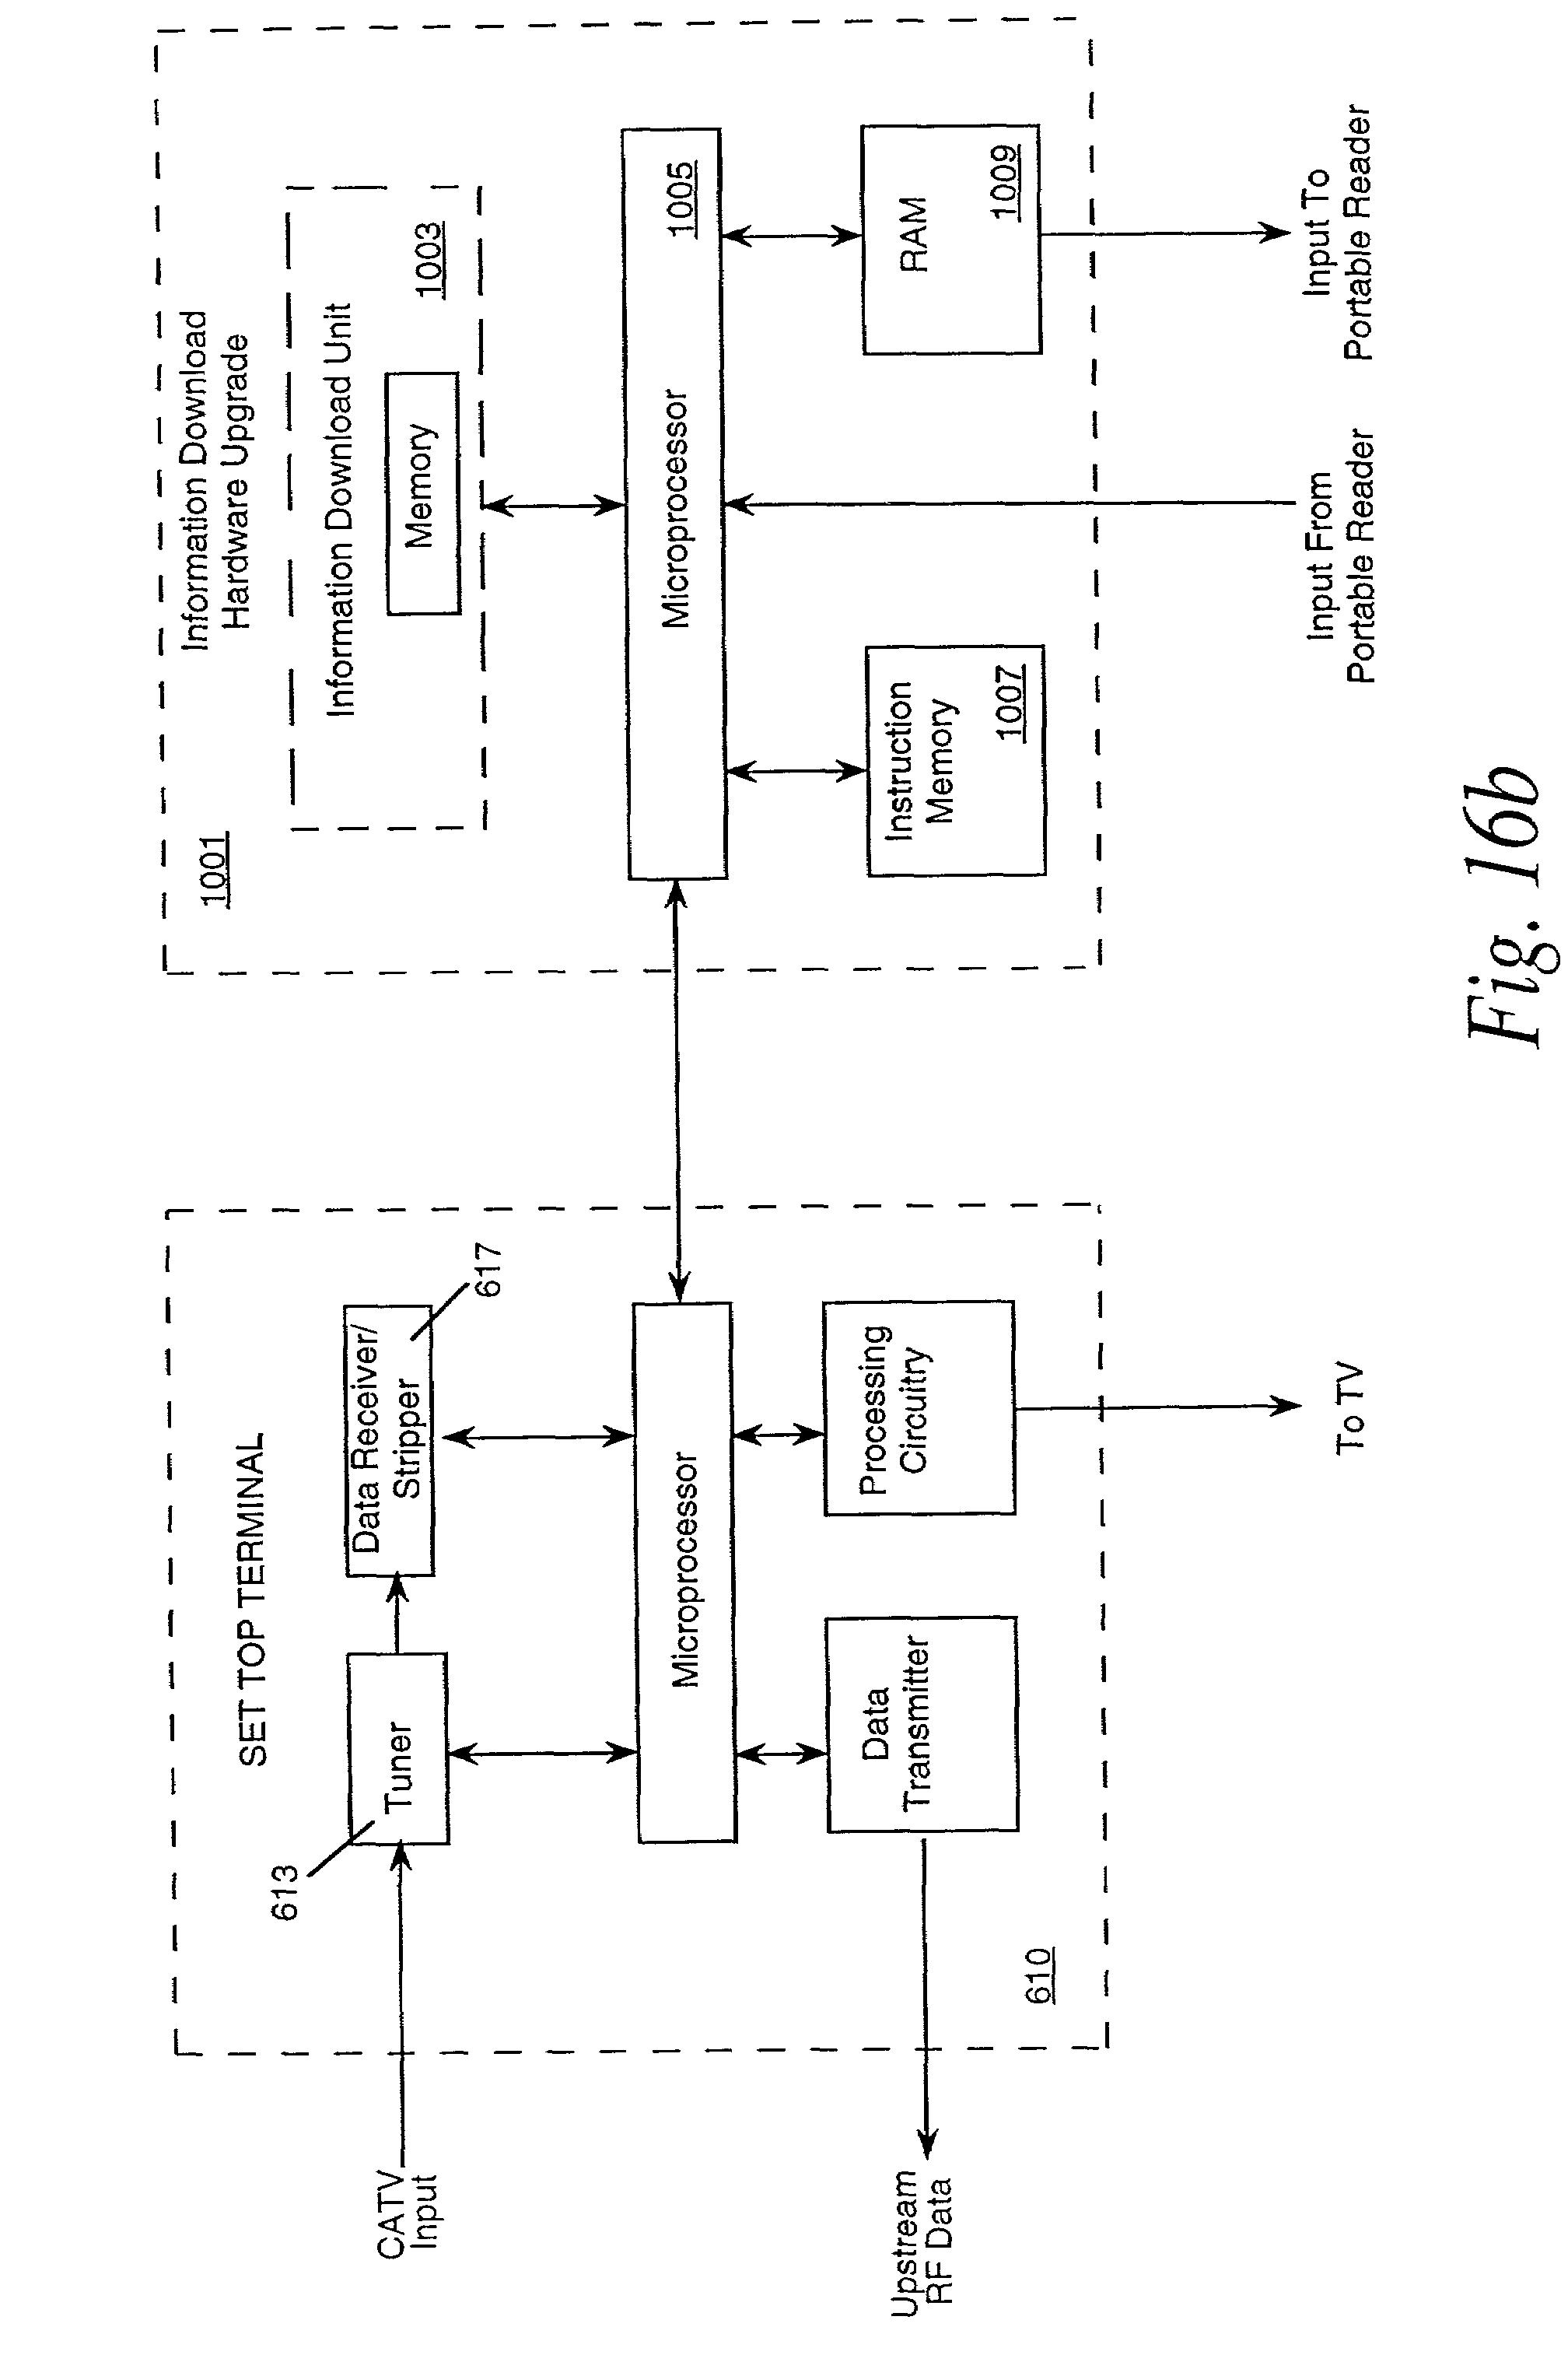 Patent US 7,509,270 B1